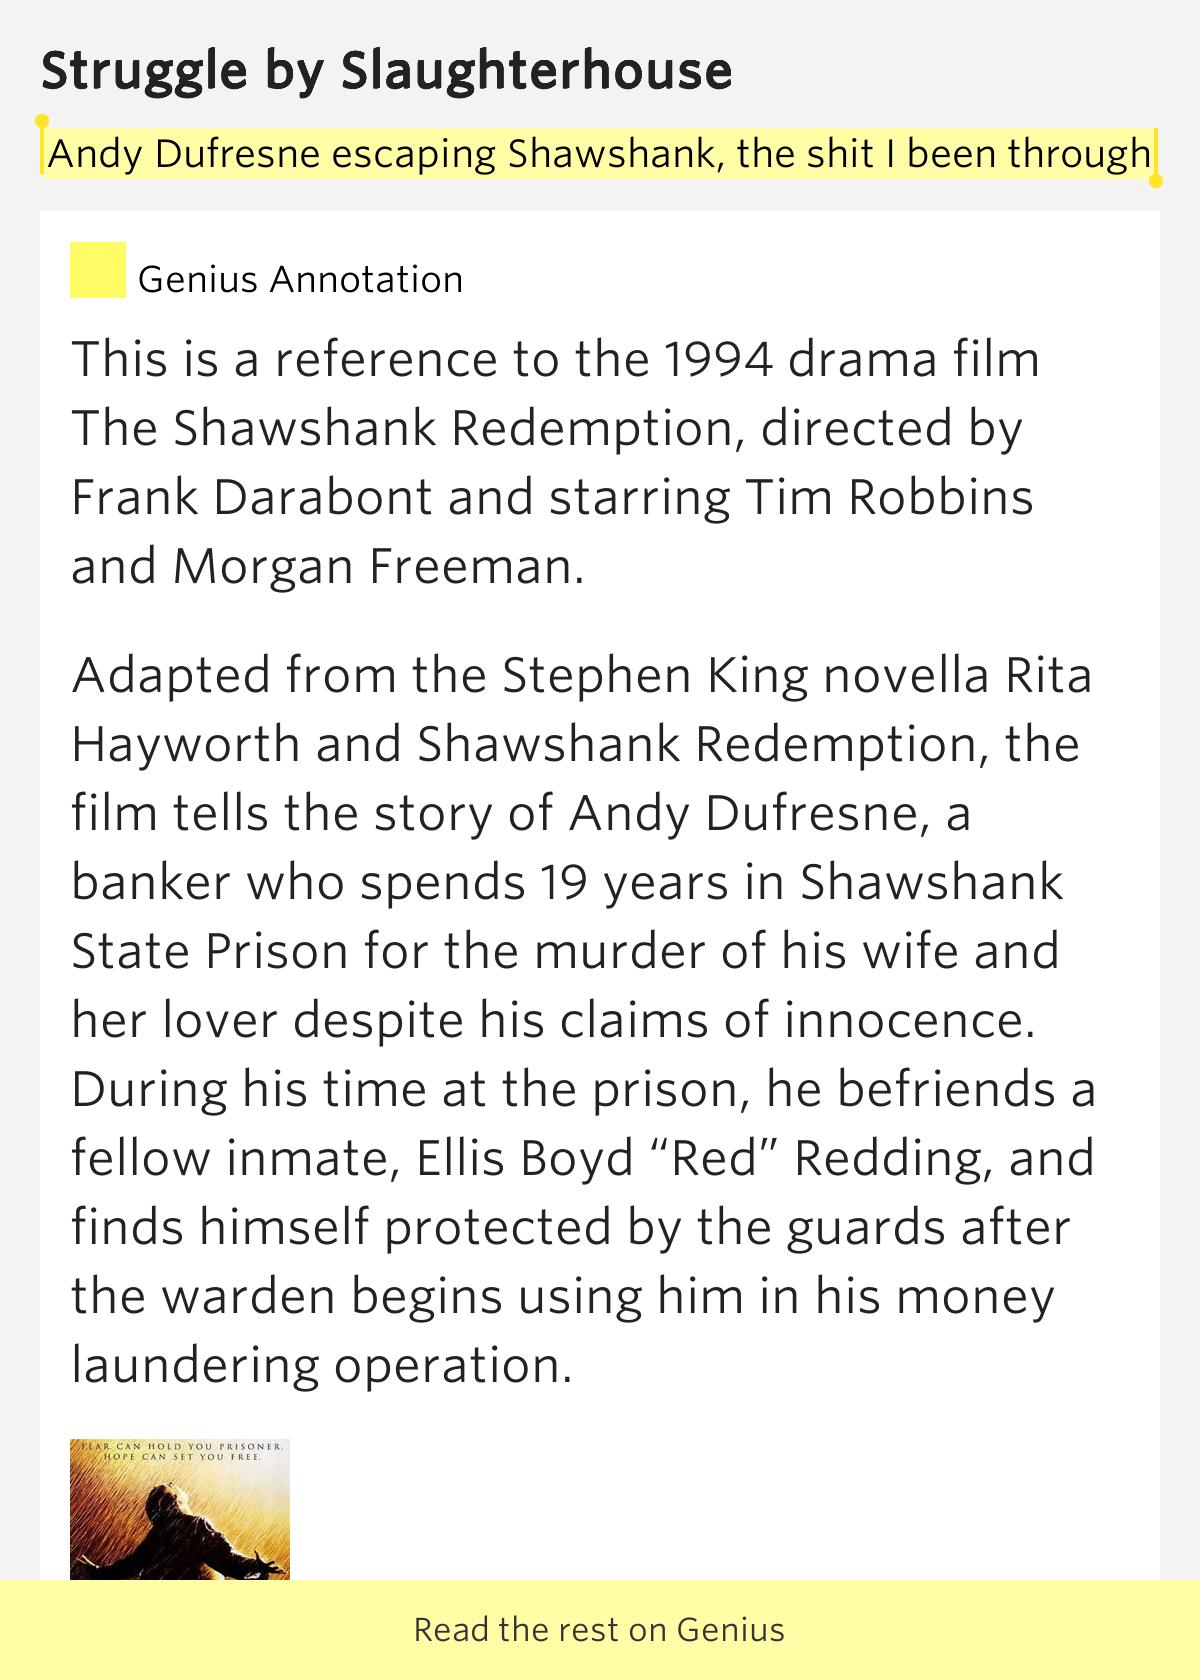 Rita Hayworth and the Shawshank Redemption